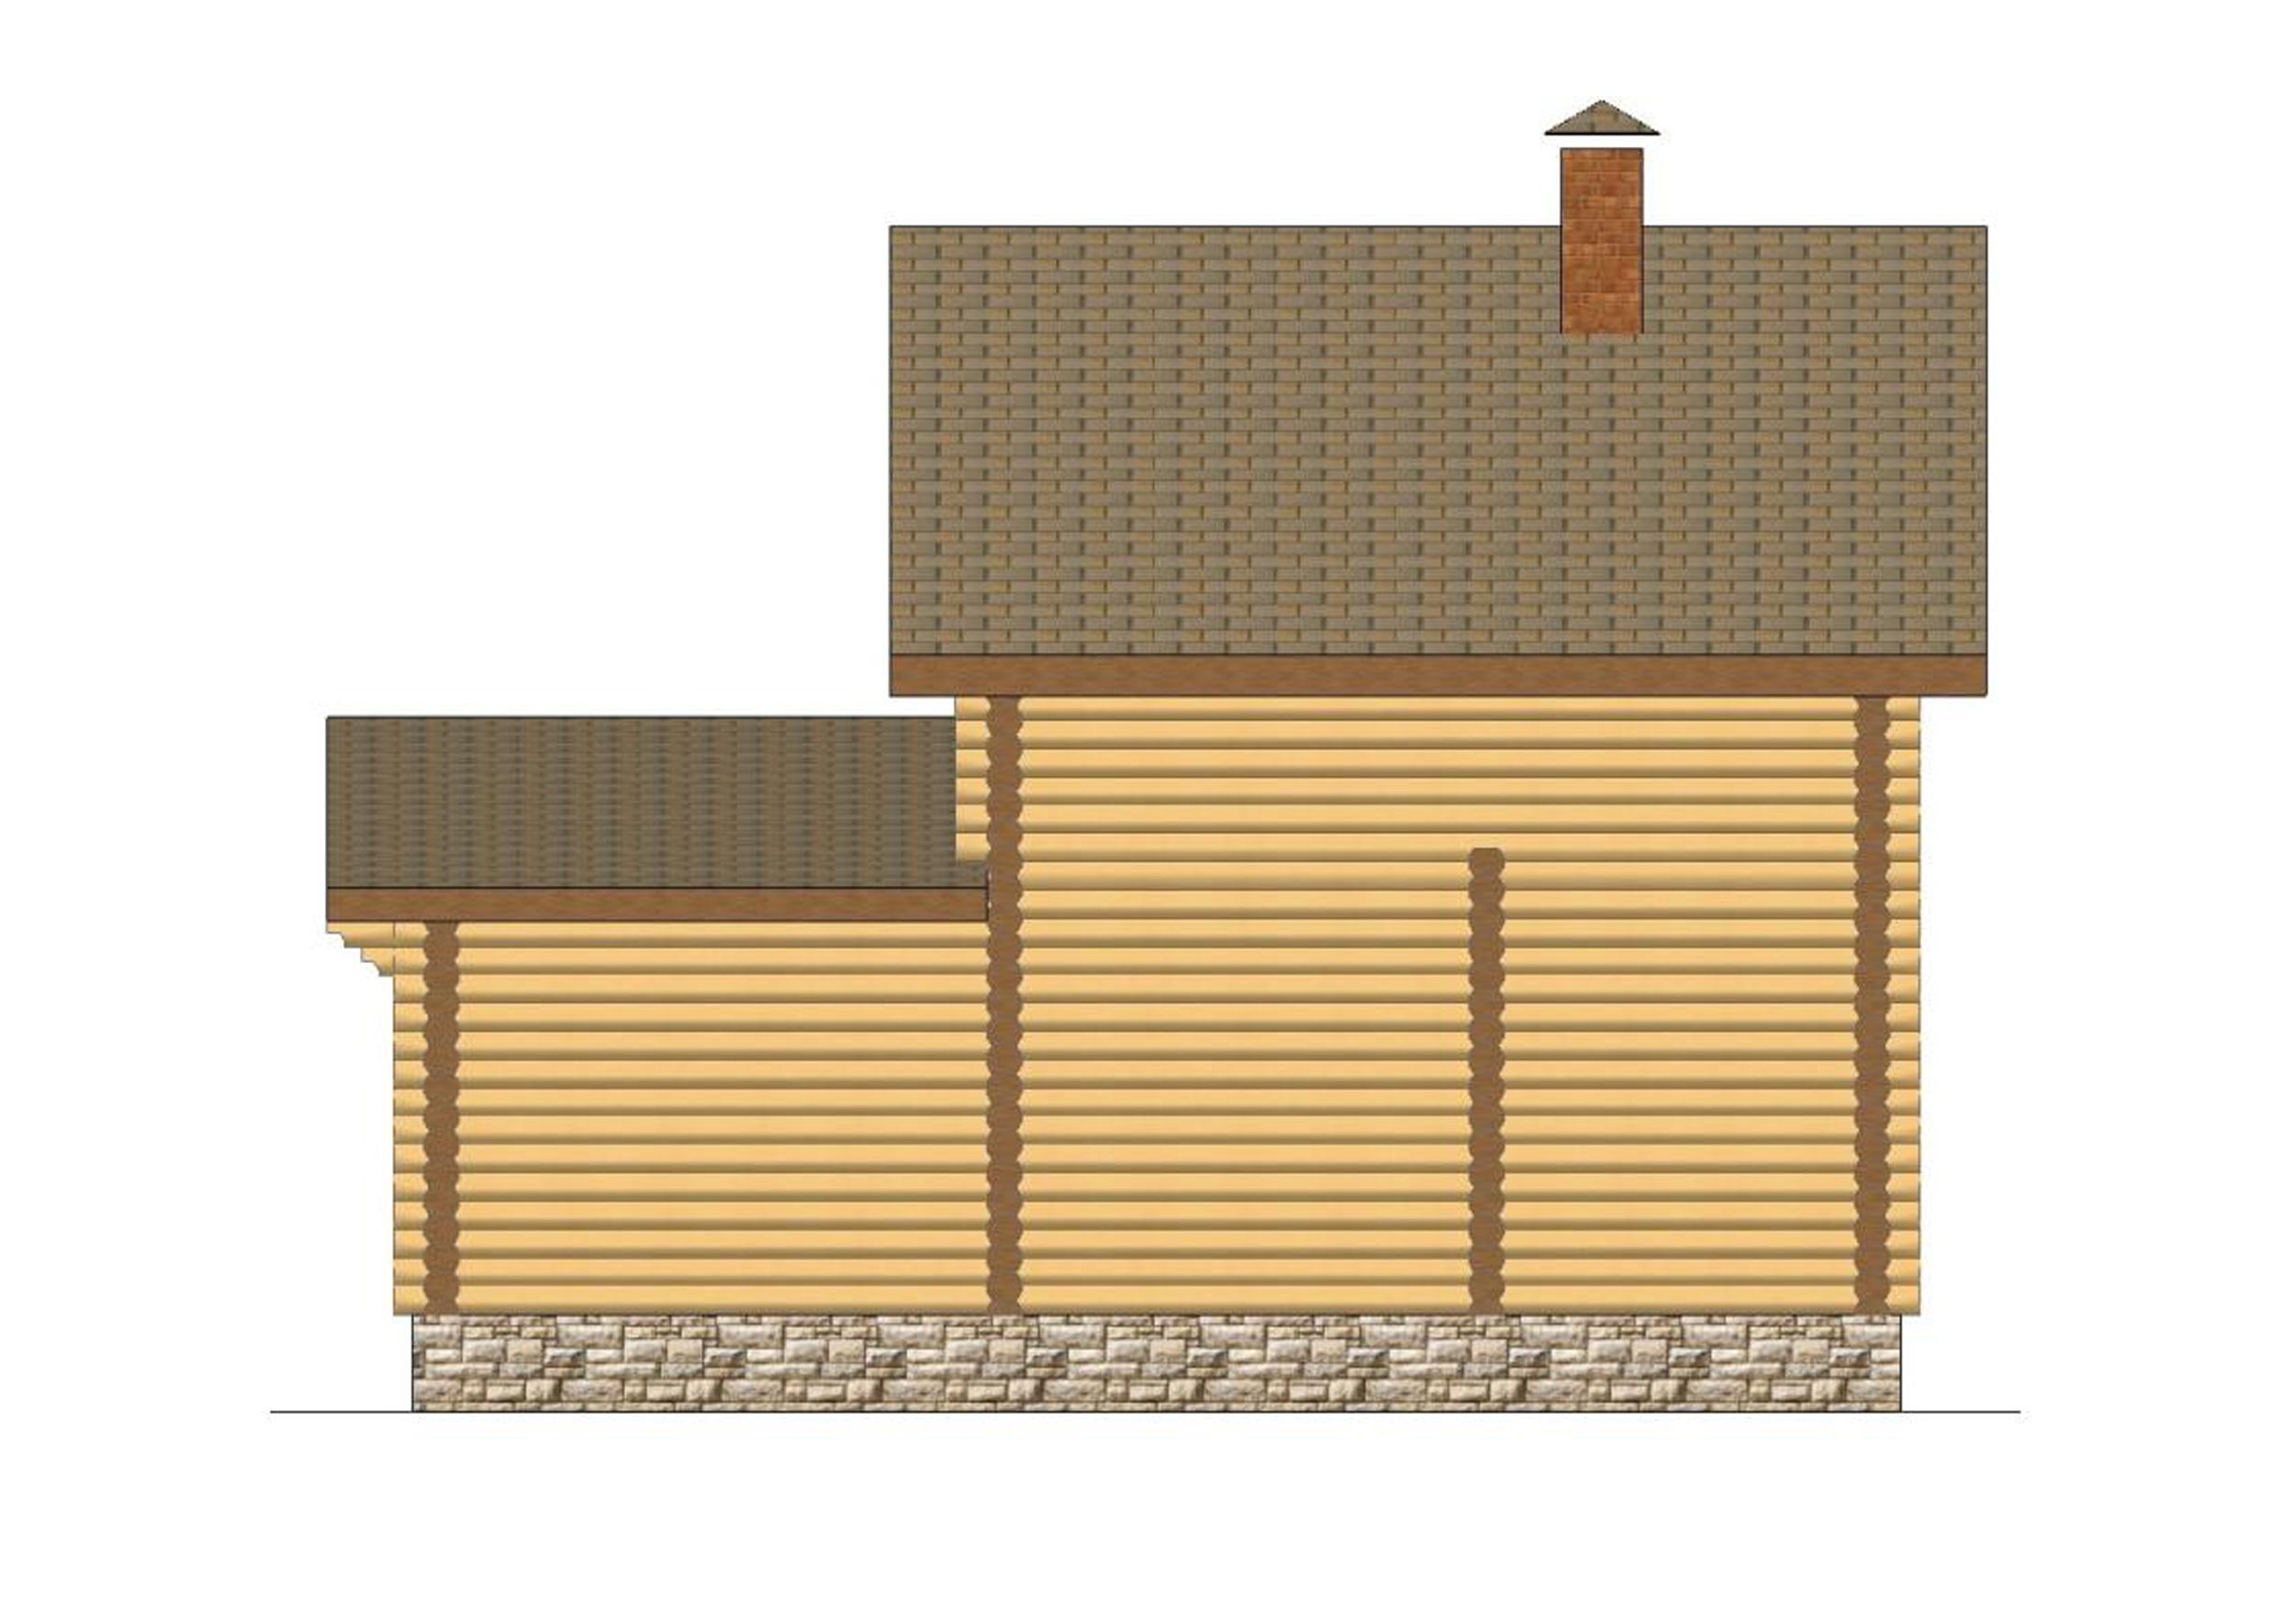 №4   S общая - 68,3 м2 фасад